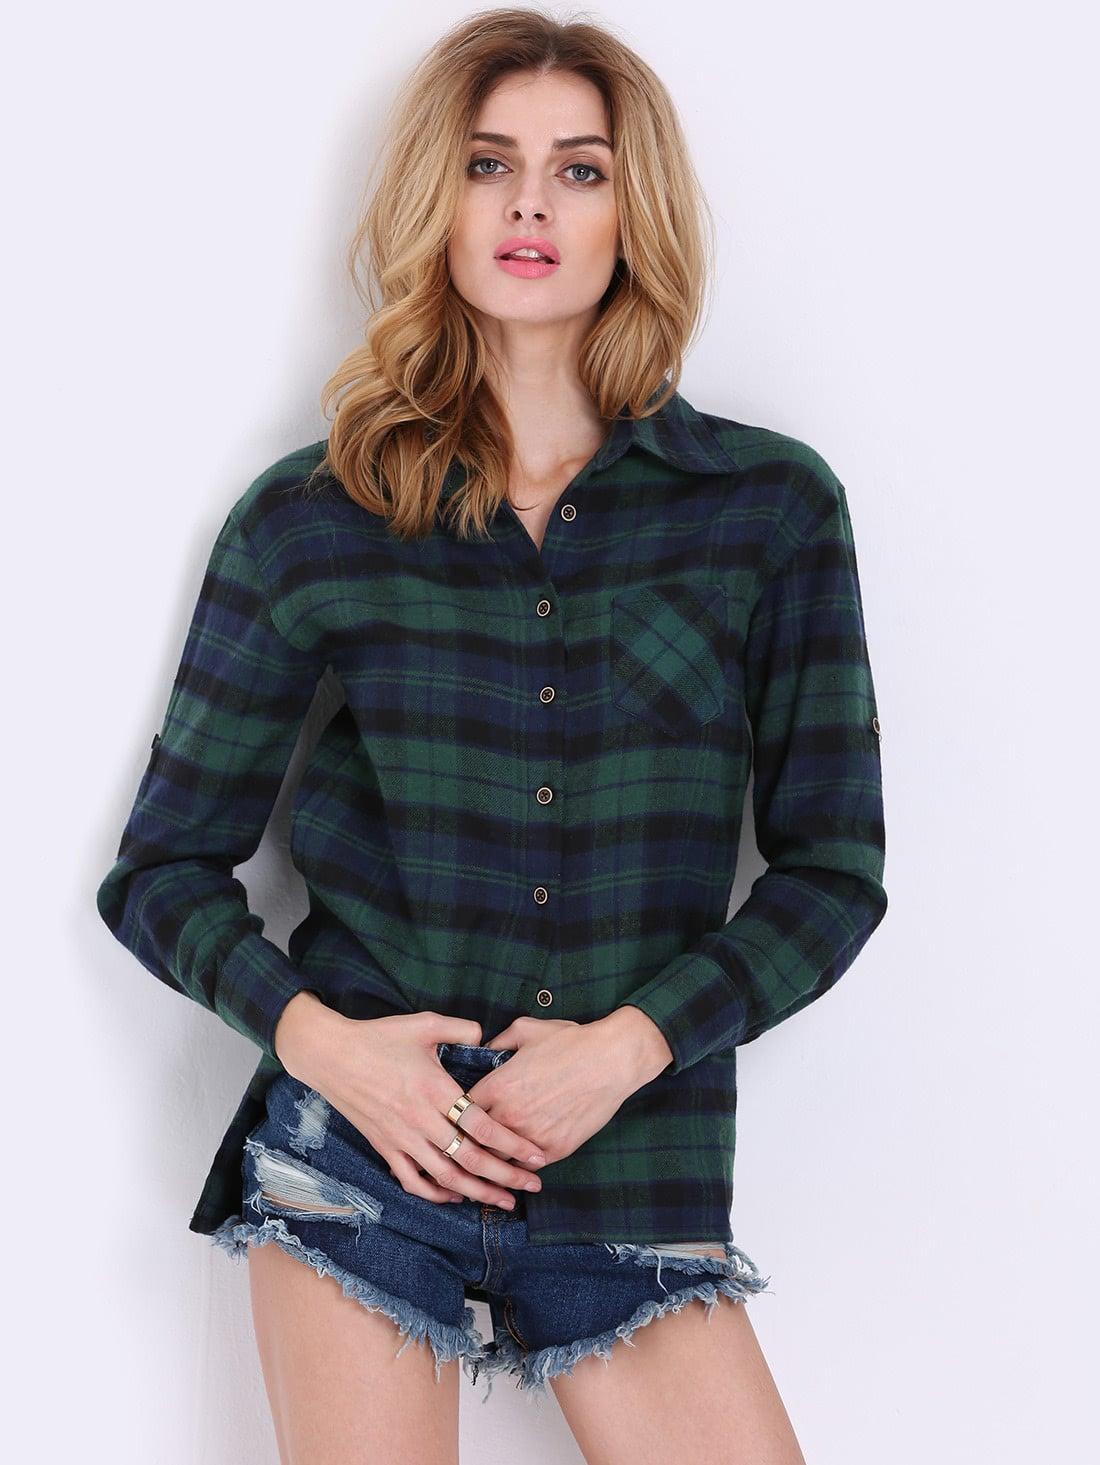 Tartan Plaid Shirt With Chest Pocket blouse14112215